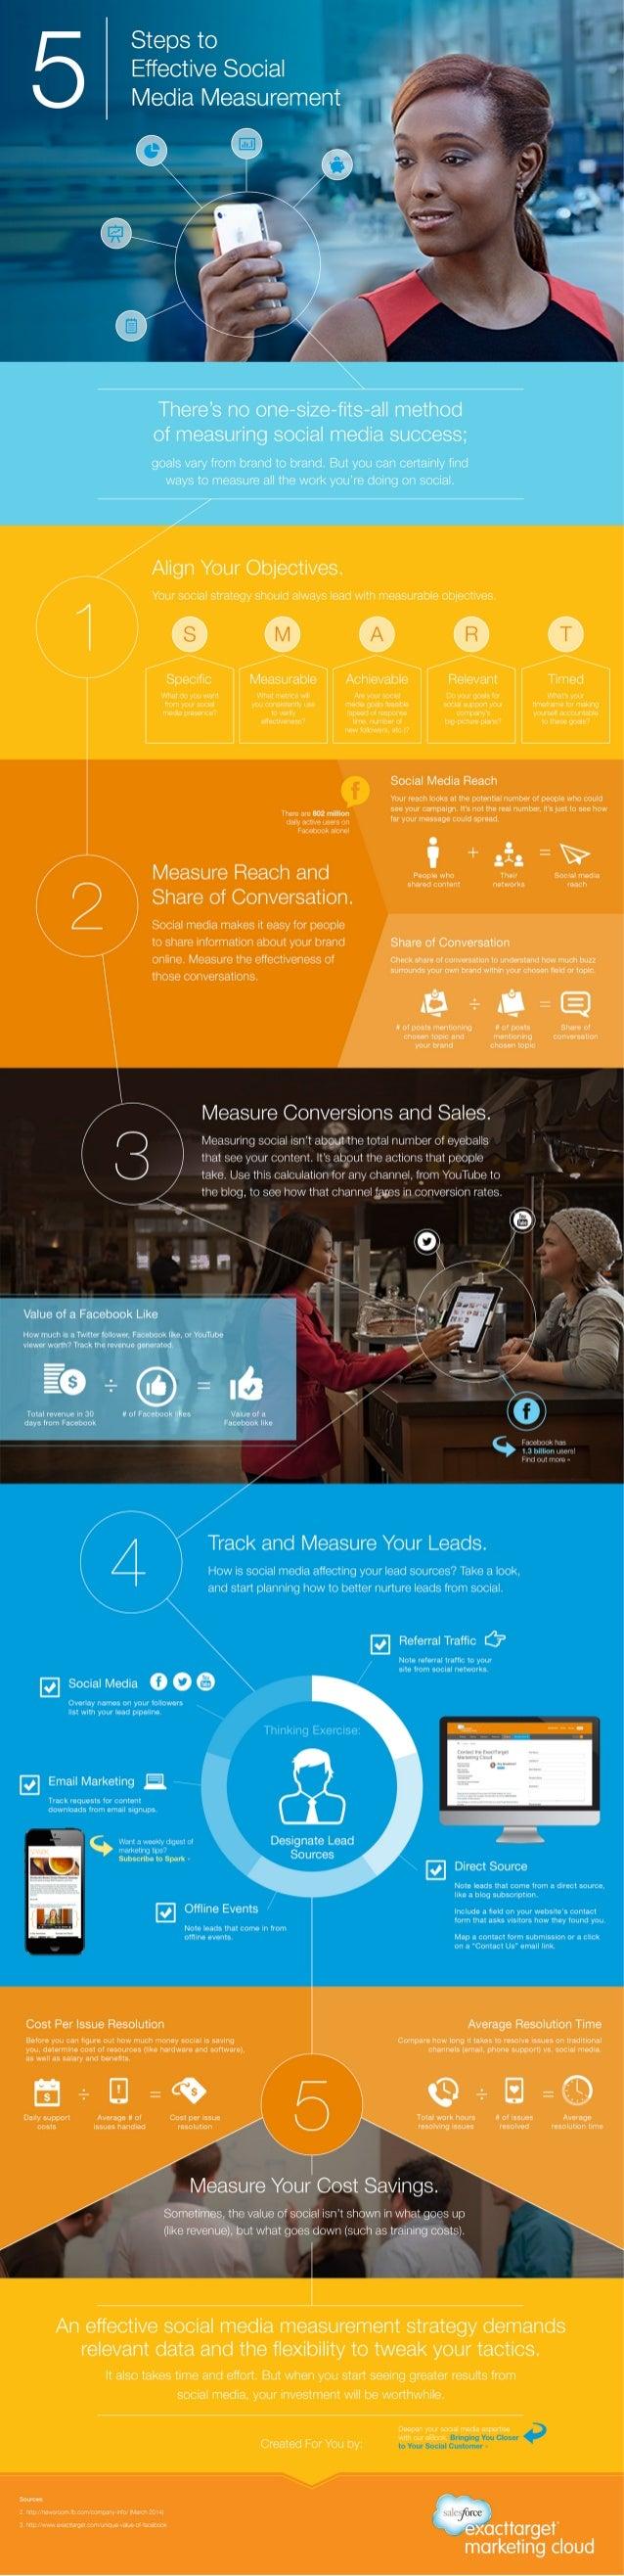 5 steps to effective social media measurement